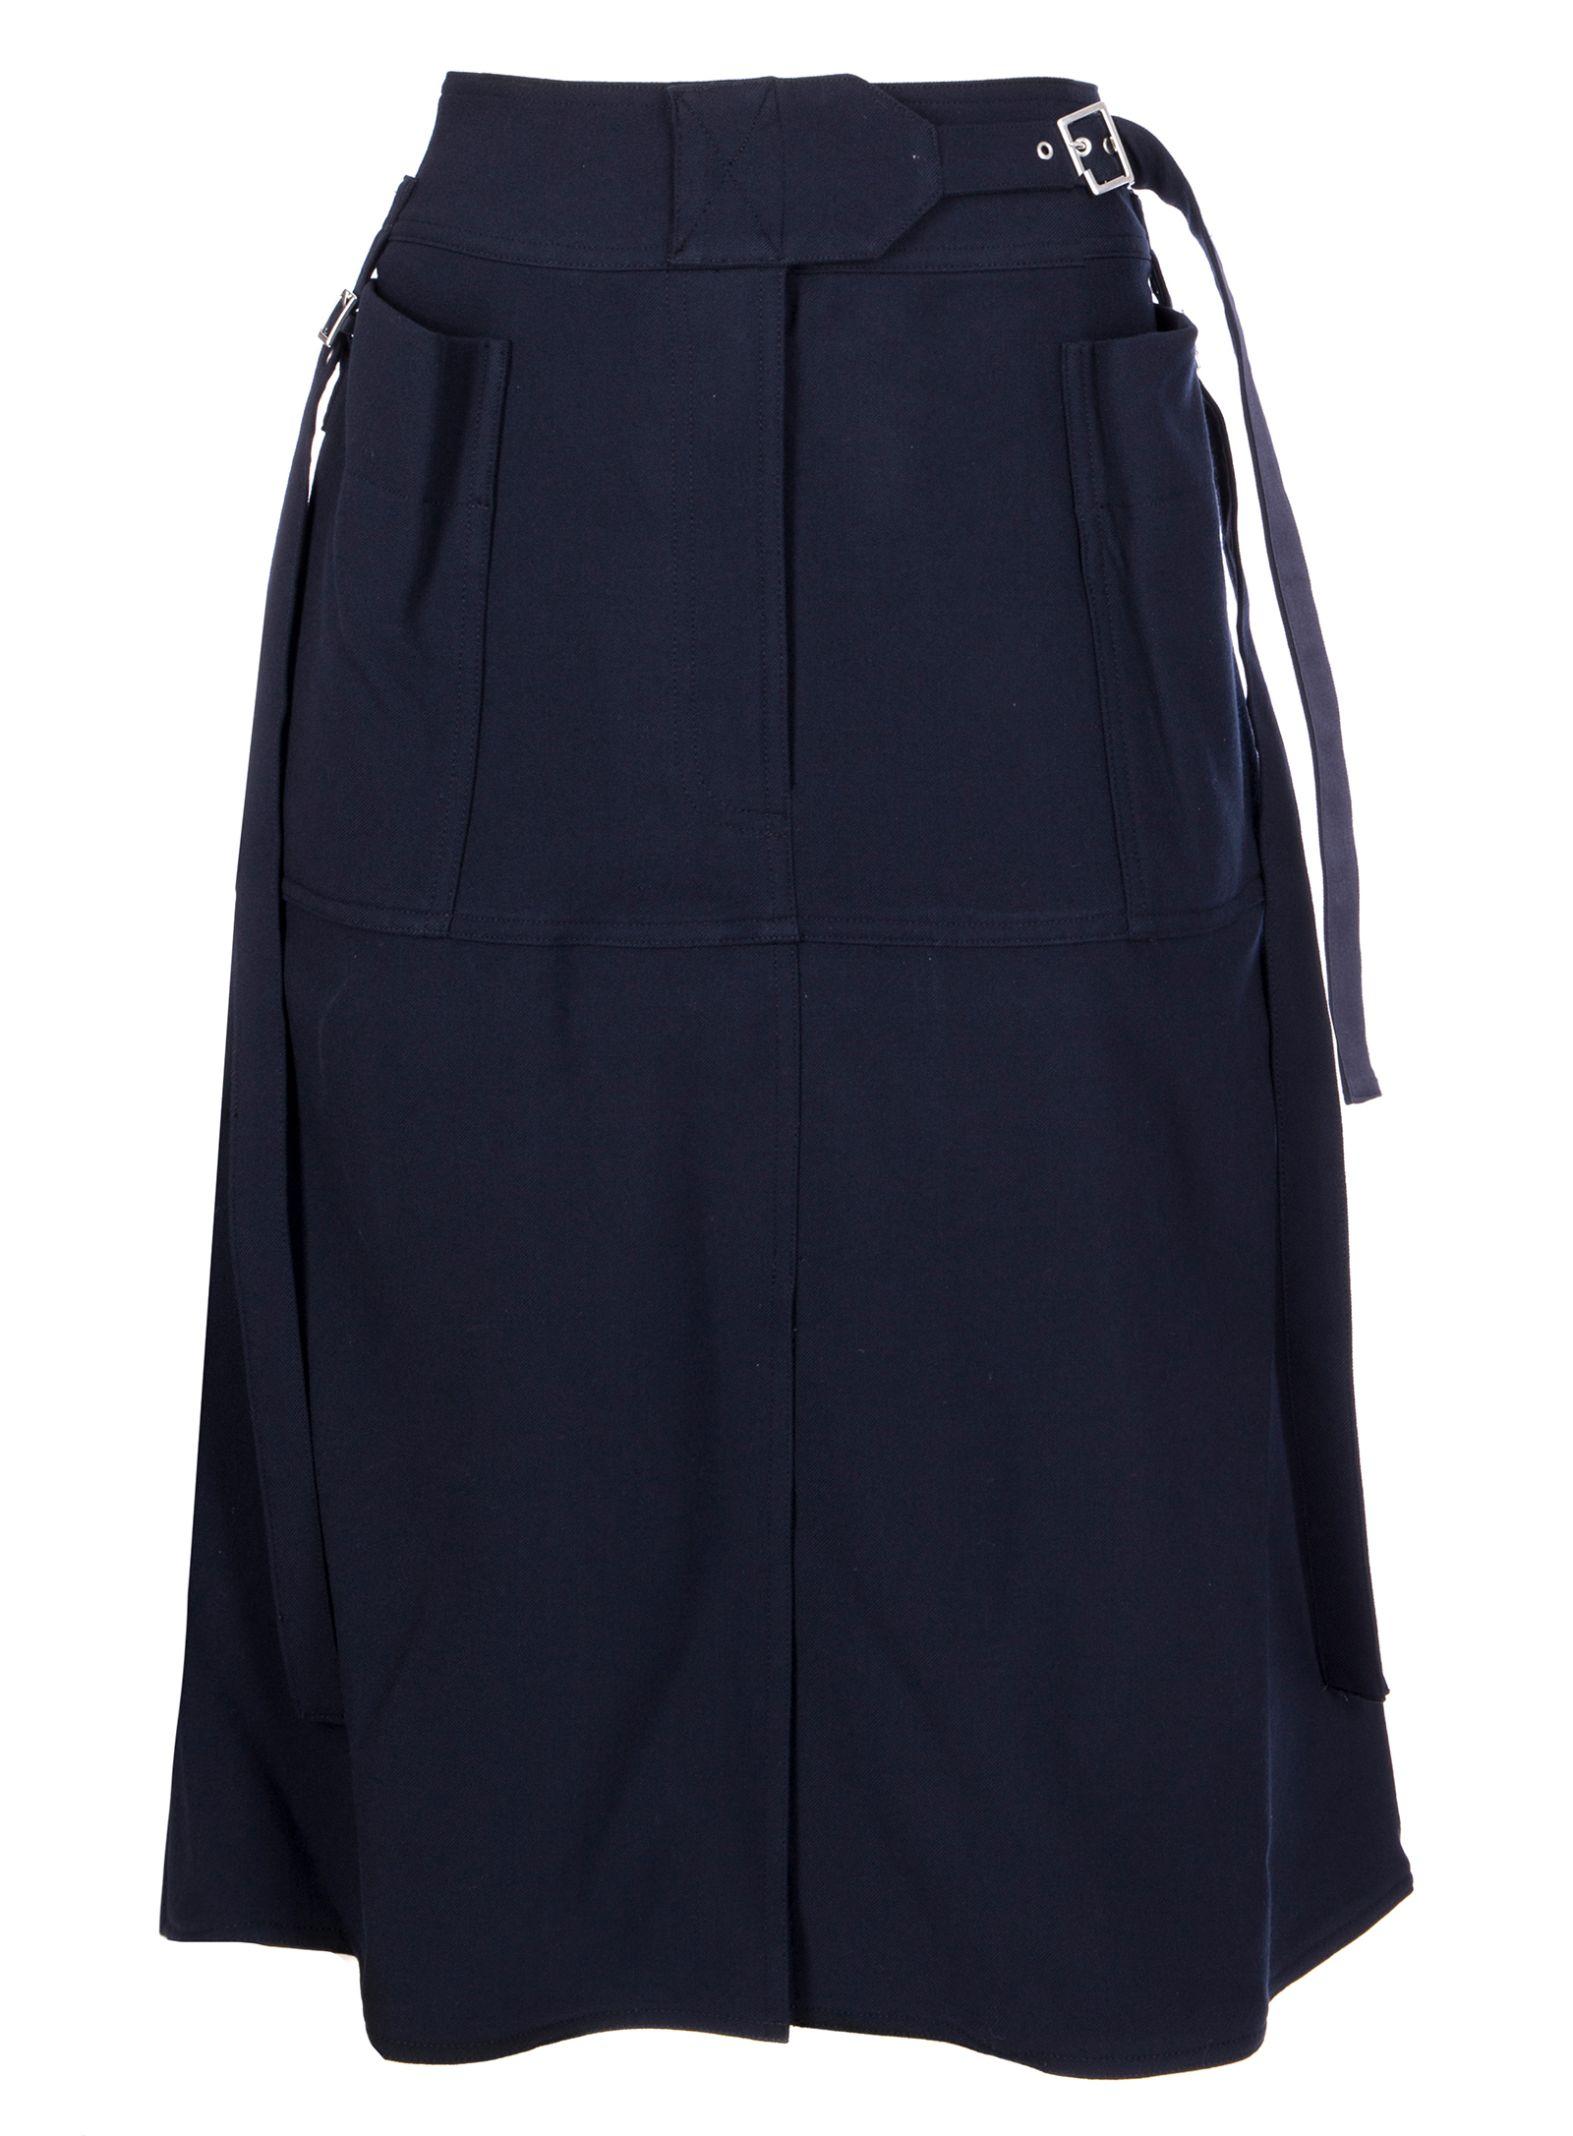 how to wear high waisted midi skirt